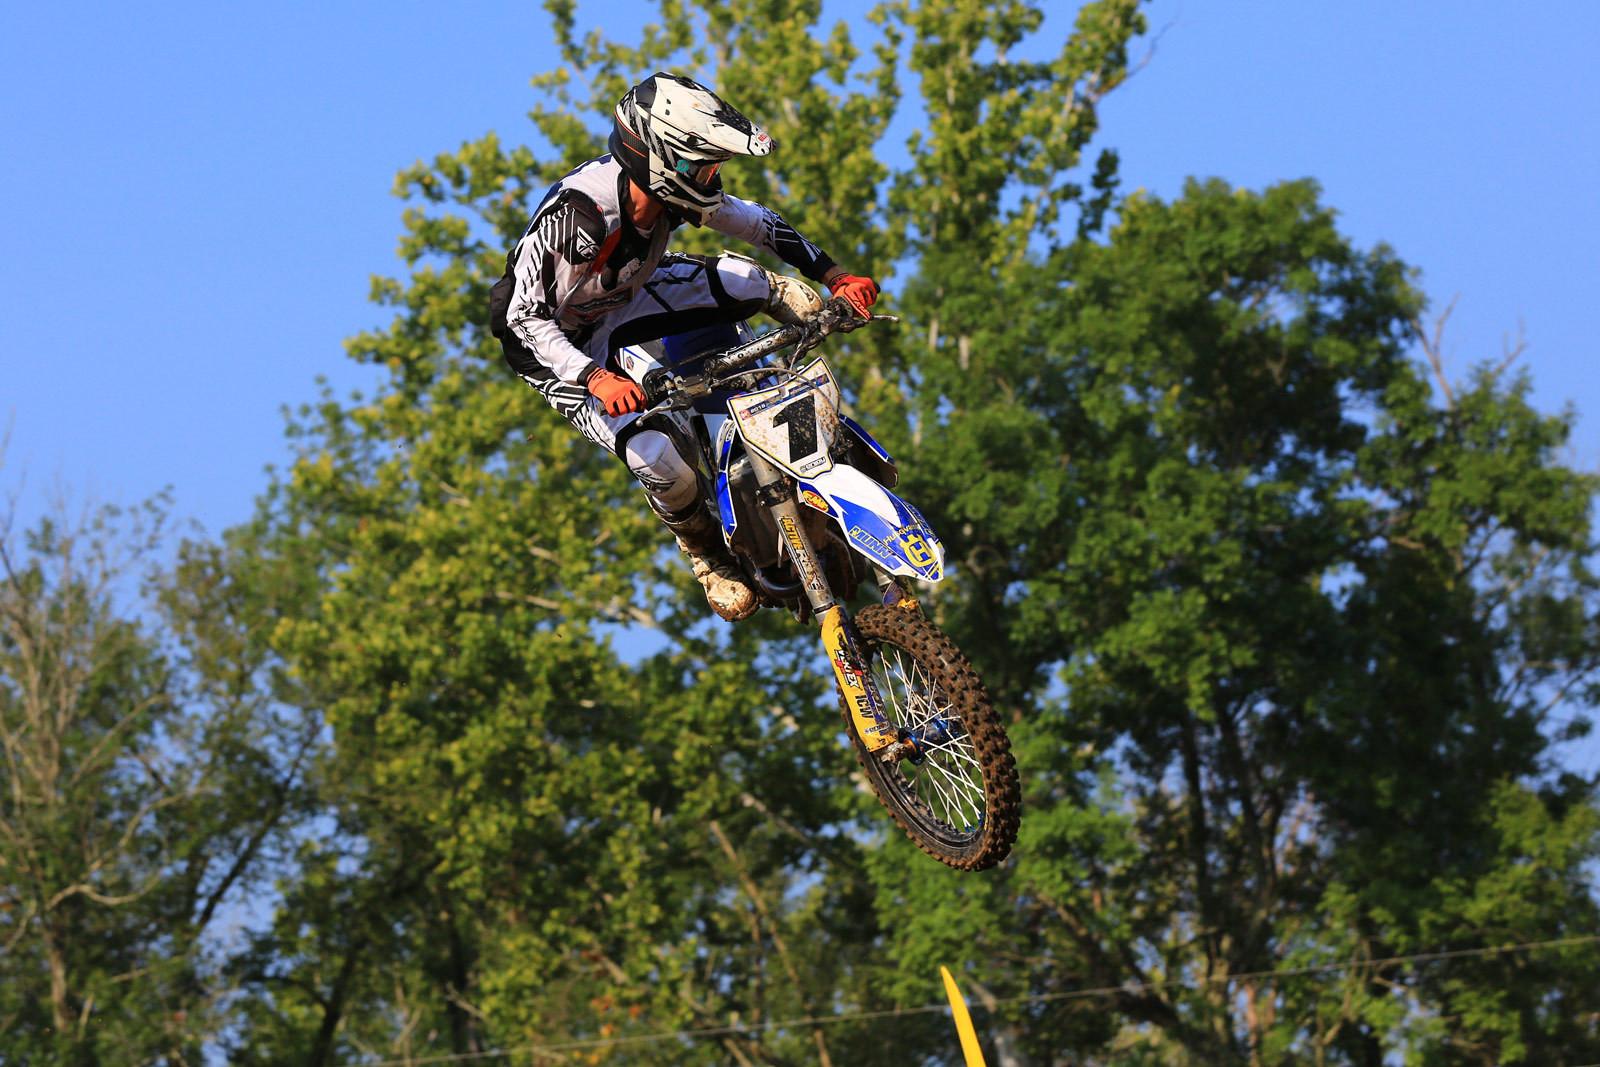 Renner - Day 1: 2015 Rocky Mountain ATV/MC AMA Amateur National Motocross Championships  - Motocross Pictures - Vital MX